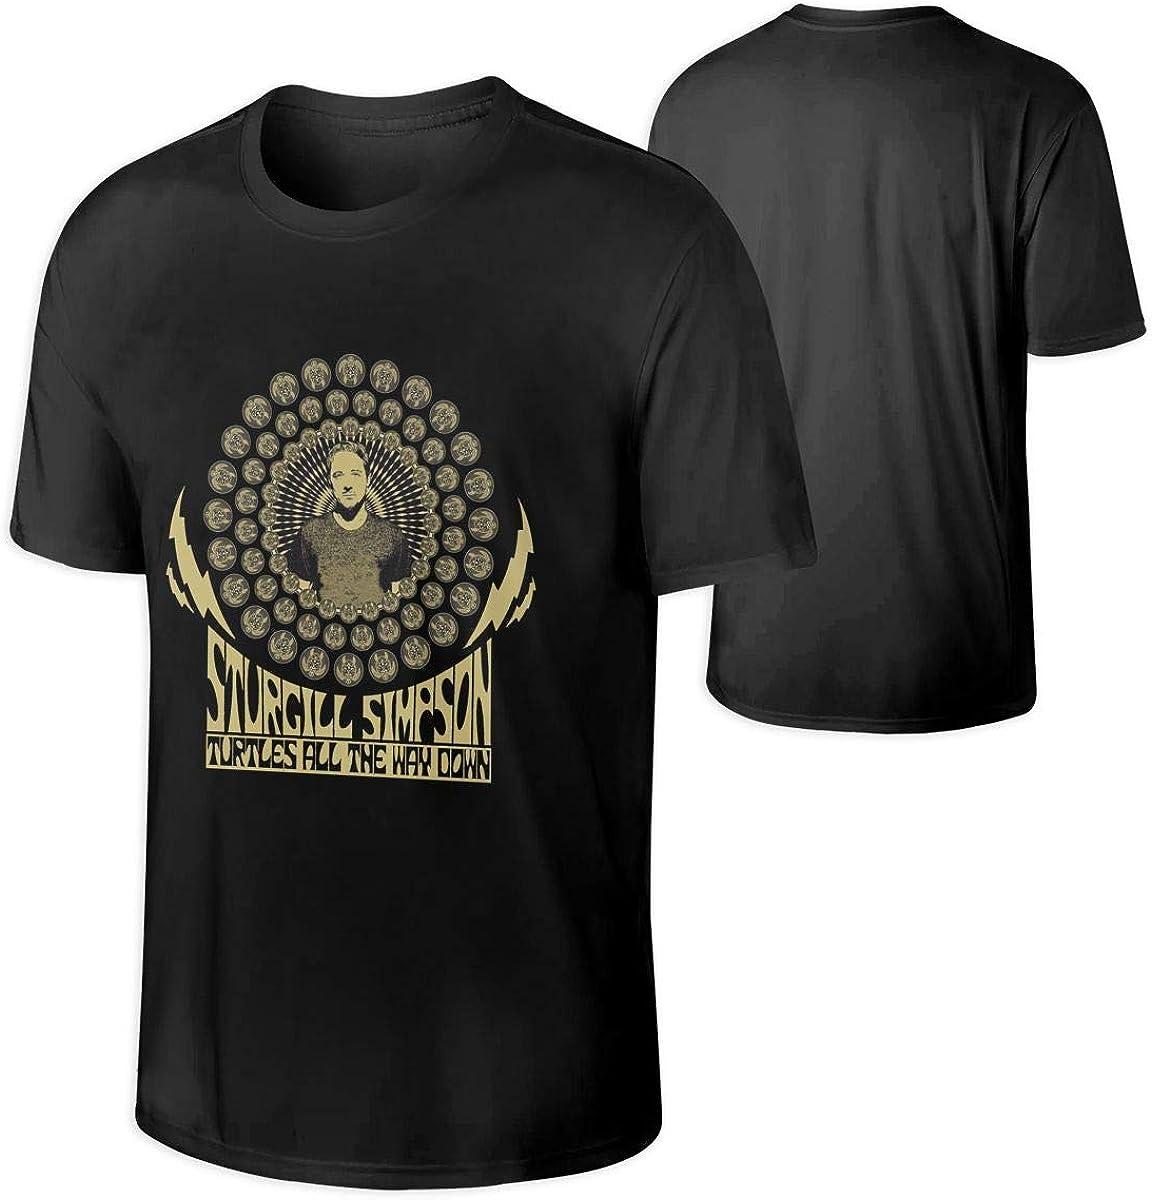 Sturgill Simpson T Shirt Girls Long Sleeve Tee Stylish Crew Neck Tshirts